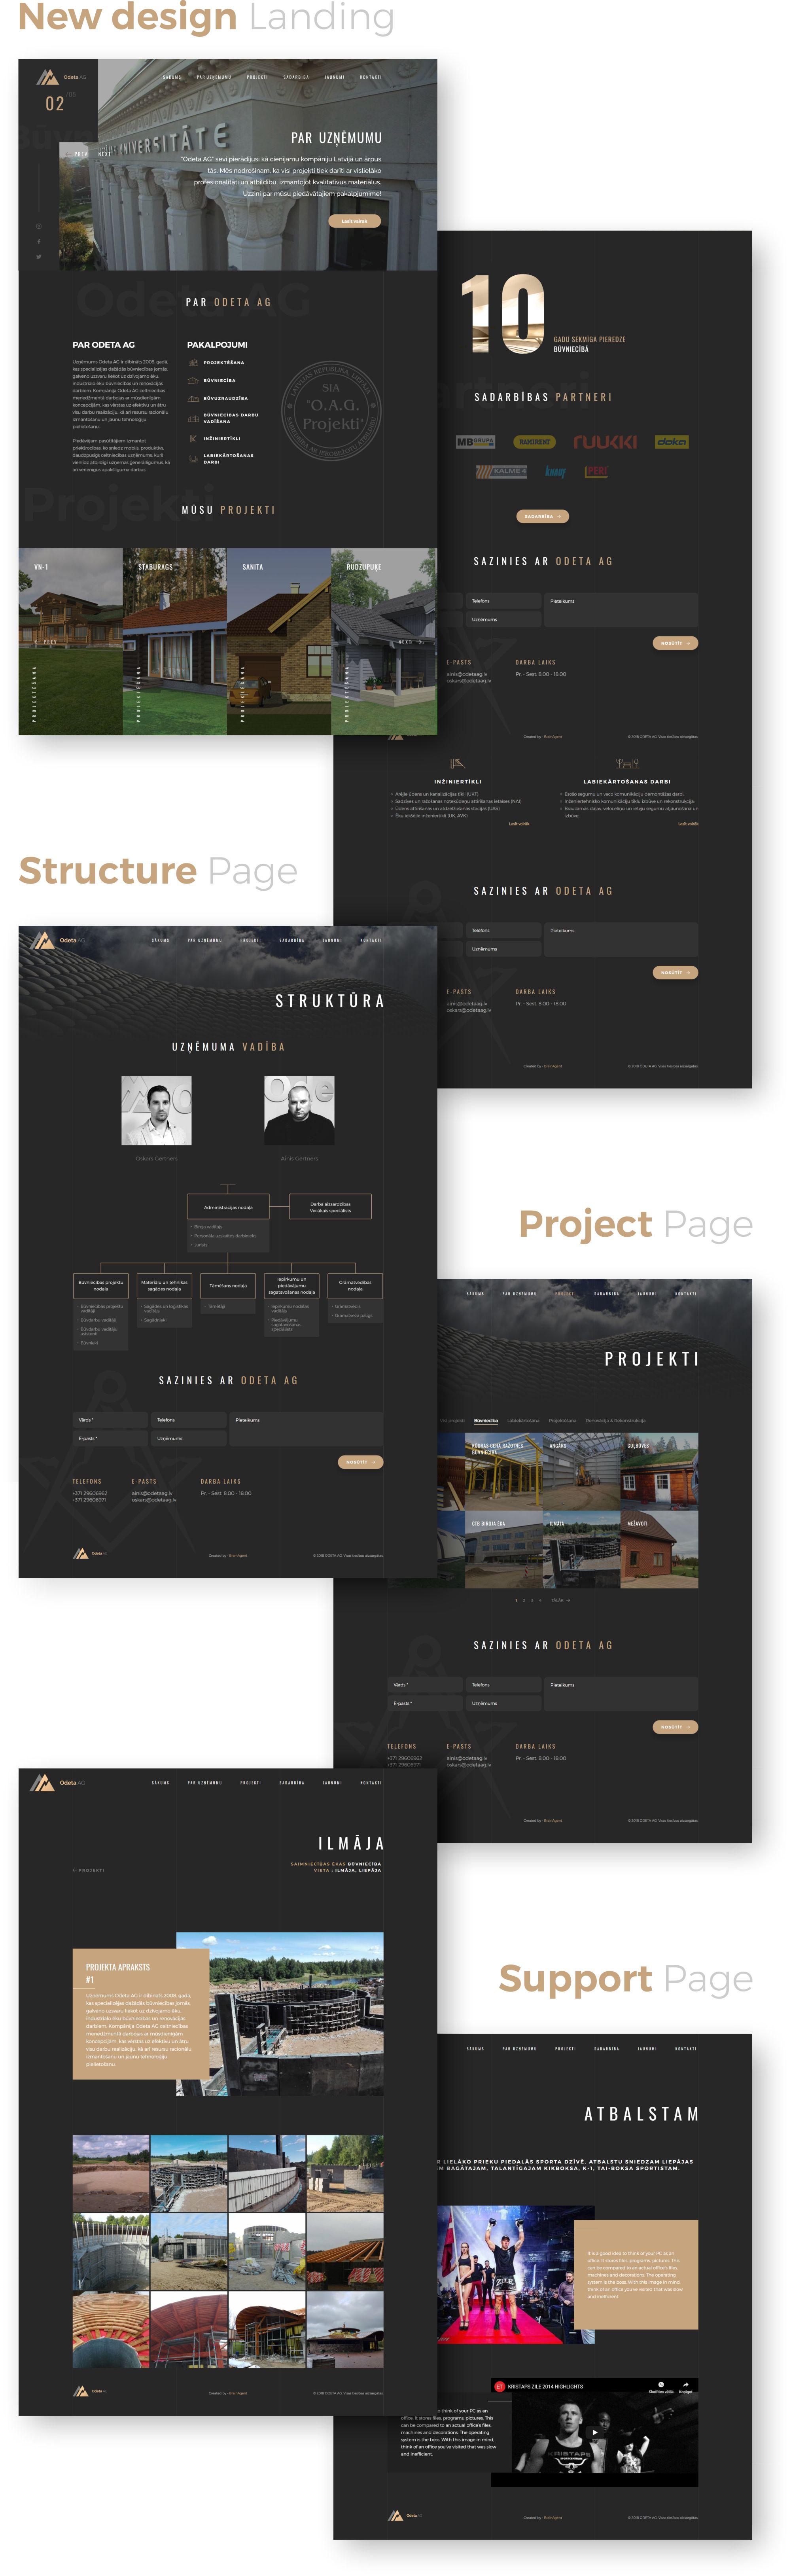 Odeta AG construction company old website design vs new - portfolio case study